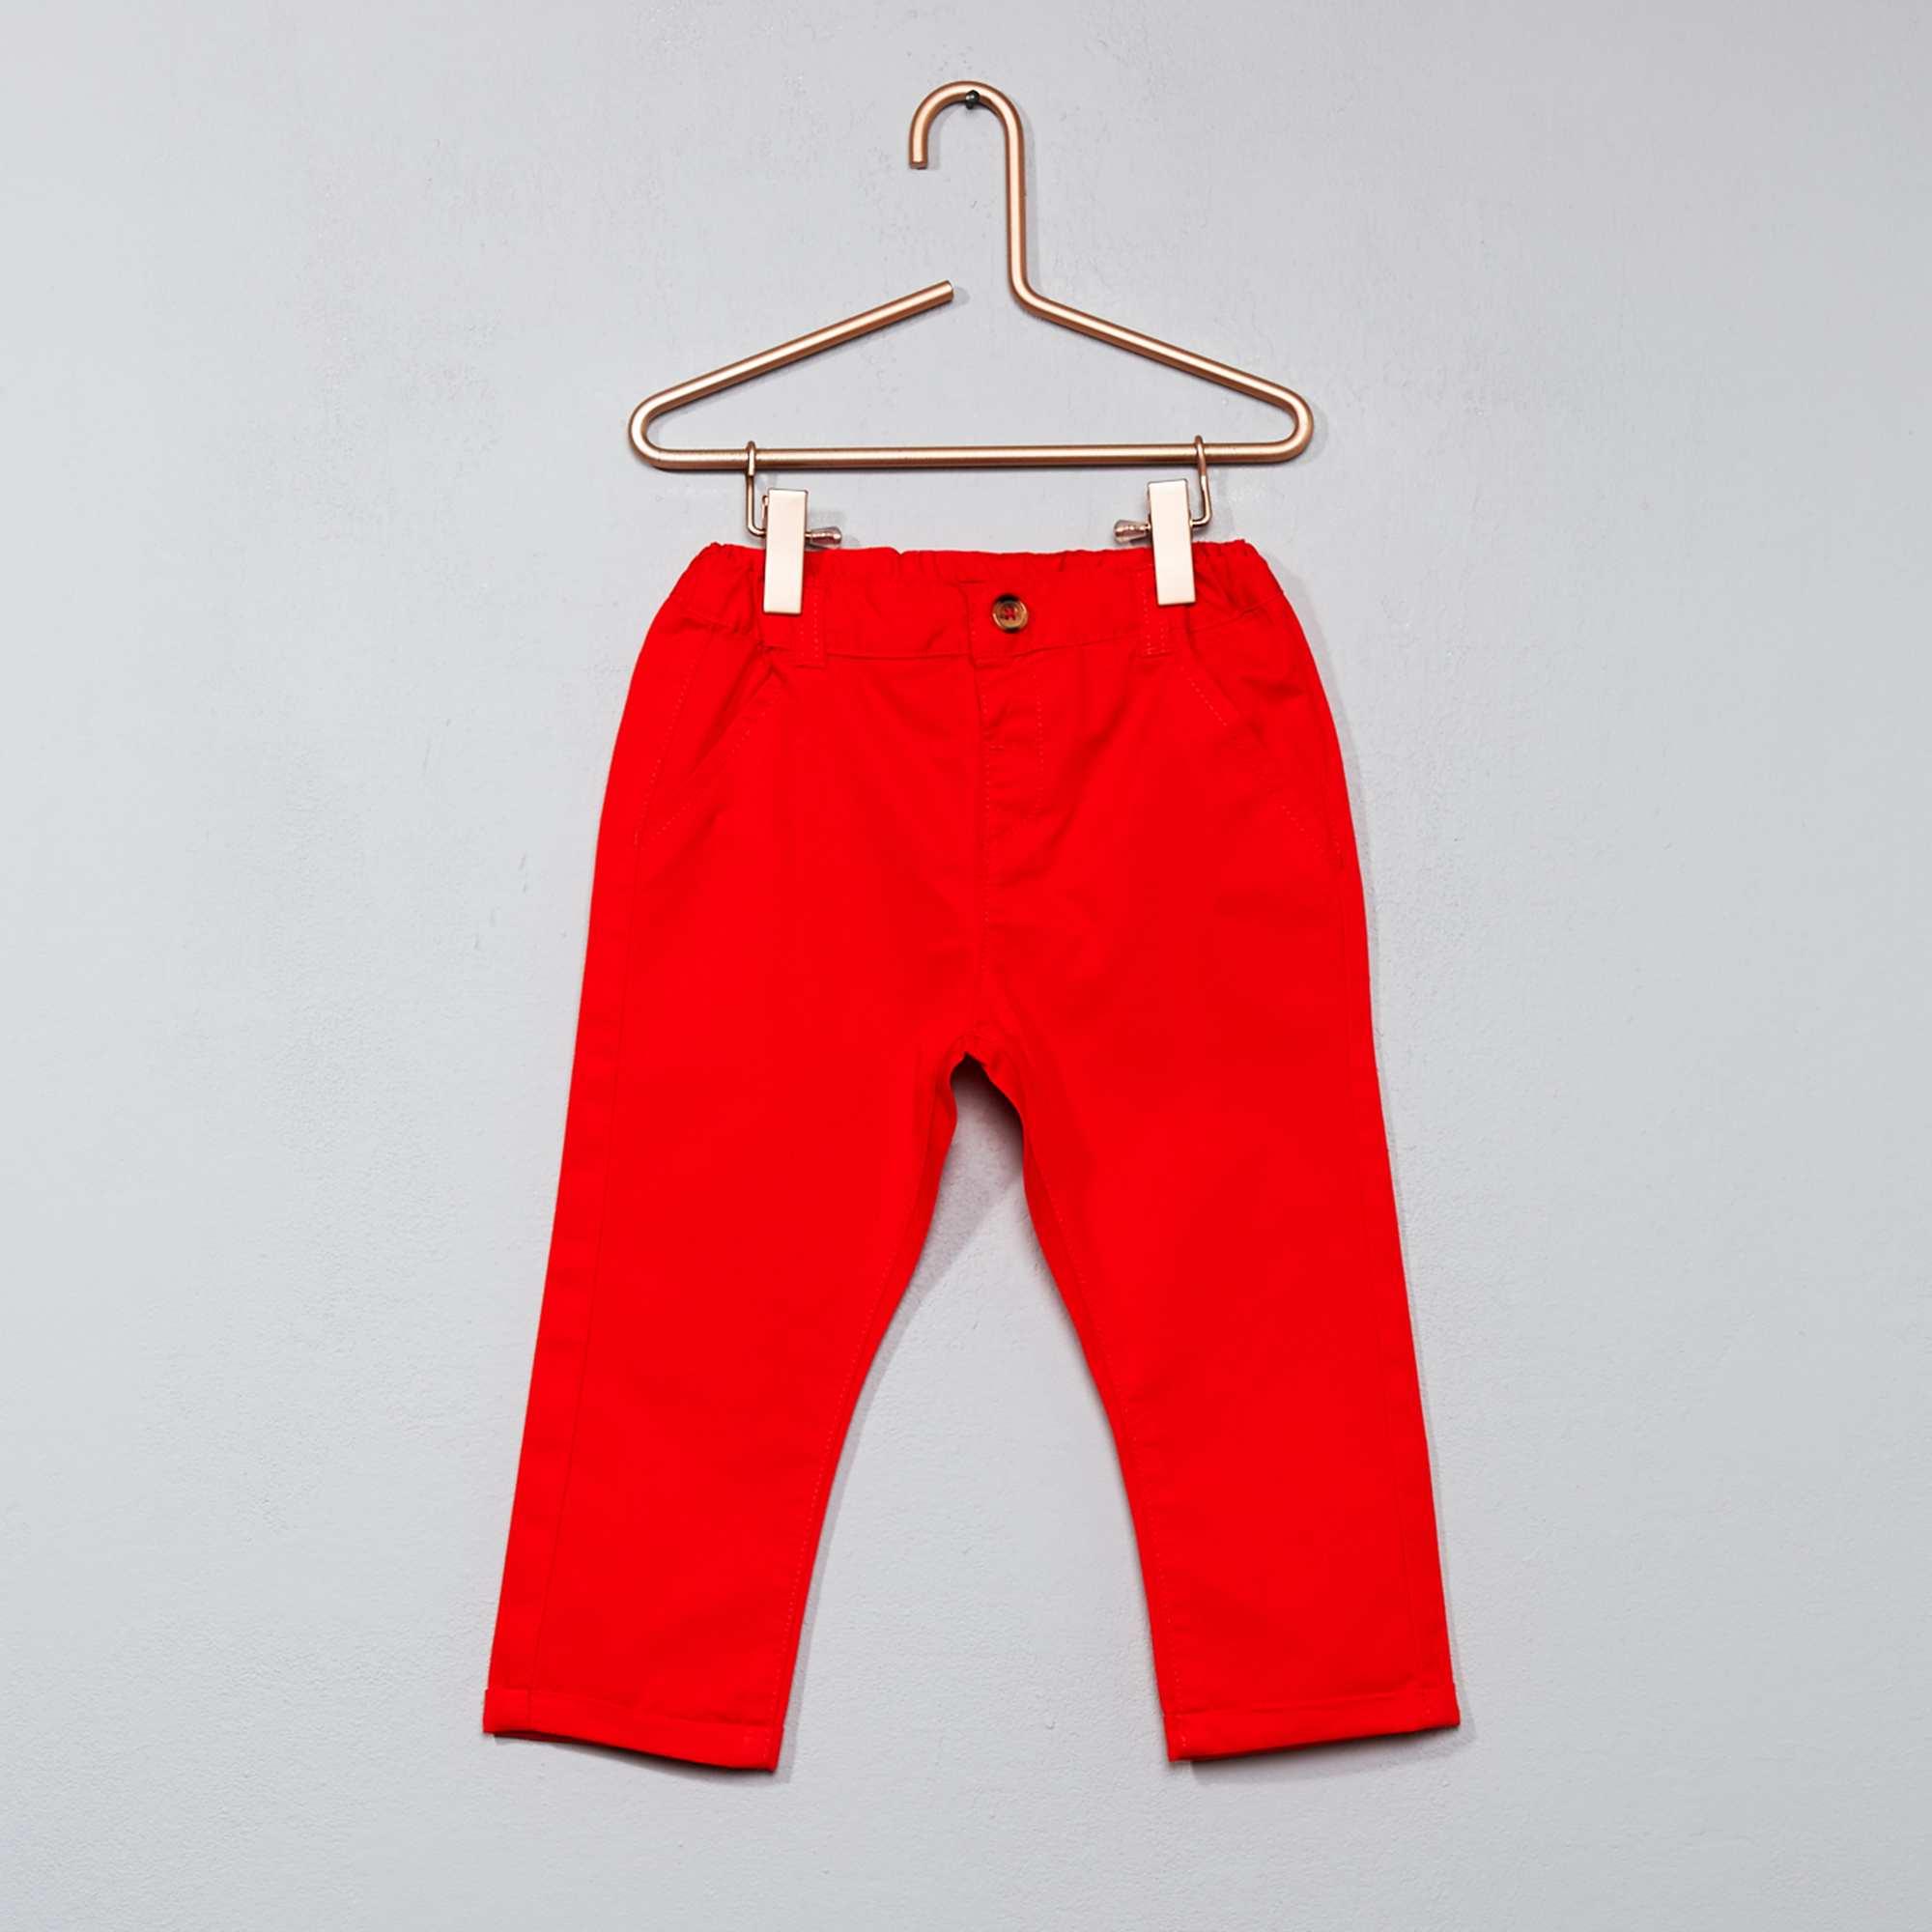 pantalon chino b b gar on rouge orang kiabi 7 00. Black Bedroom Furniture Sets. Home Design Ideas